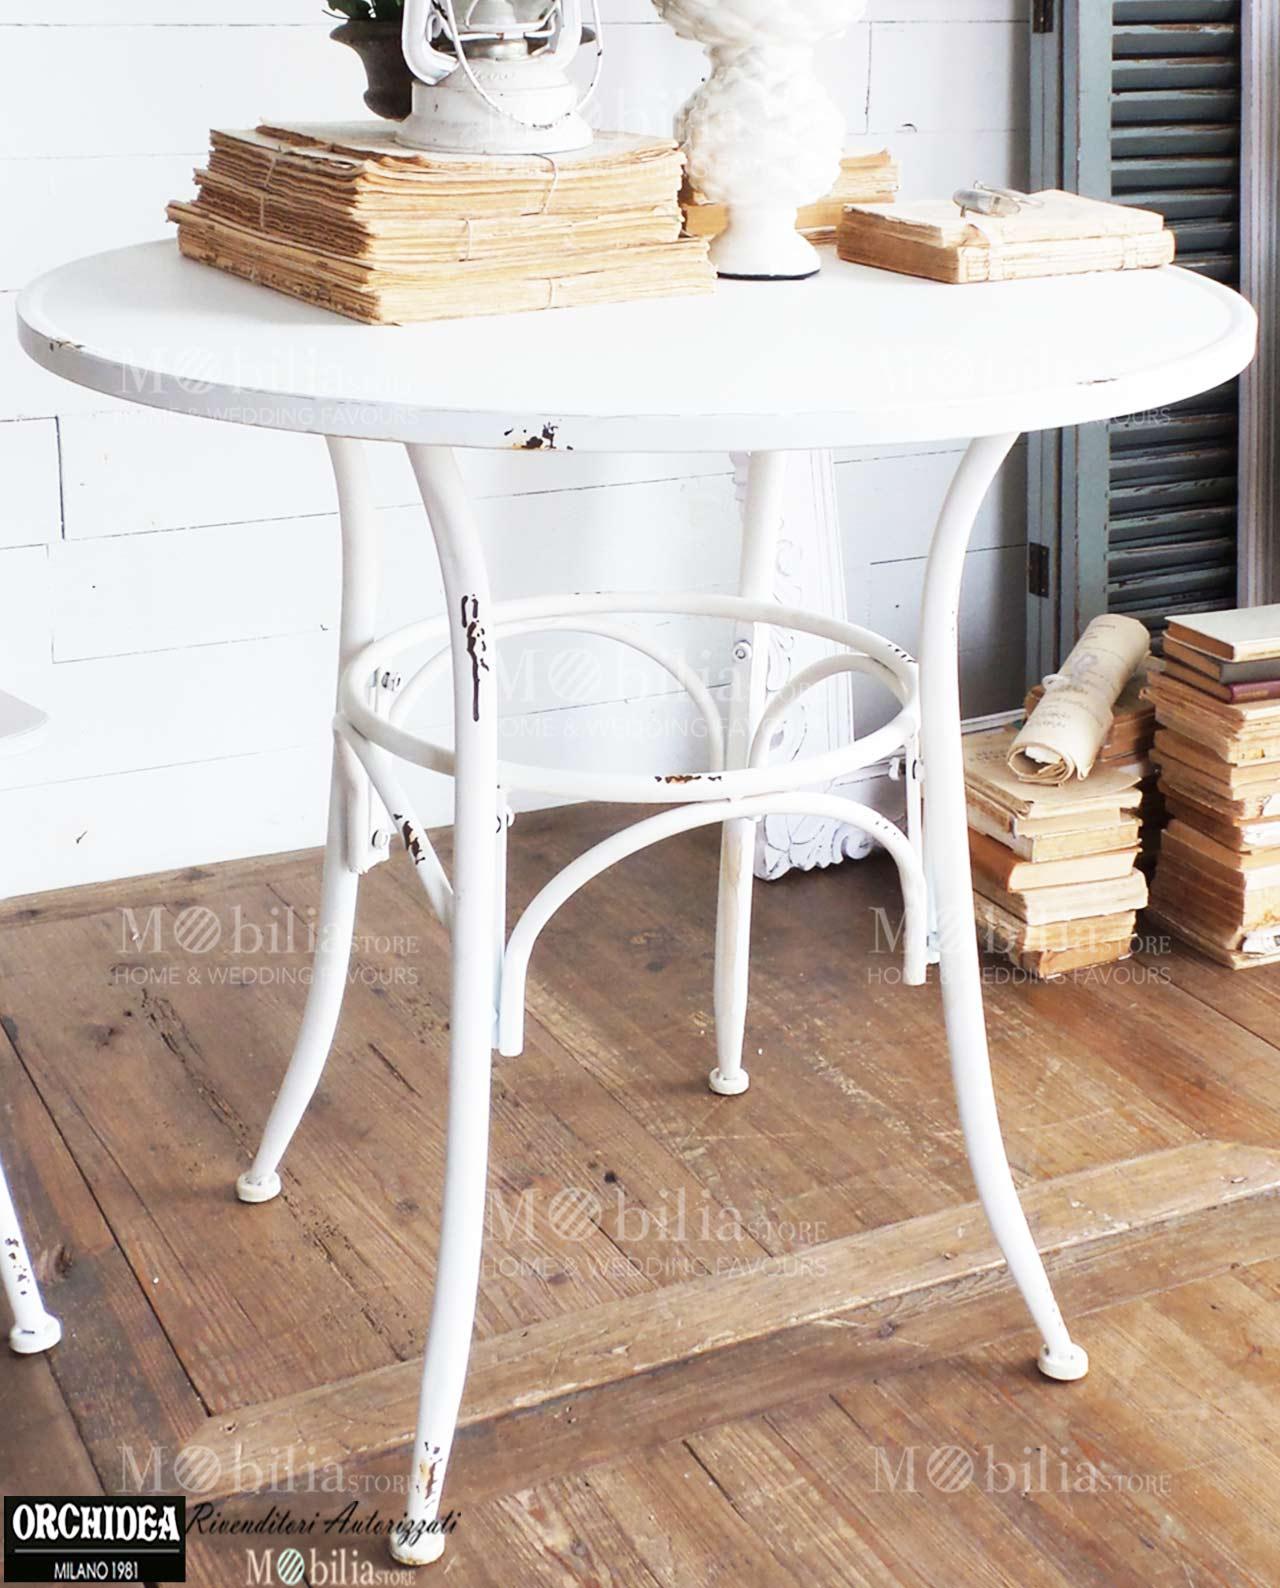 Tavoli da giardino rotondi Ferro Battuto vintage – Mobilia Store Home & Favours